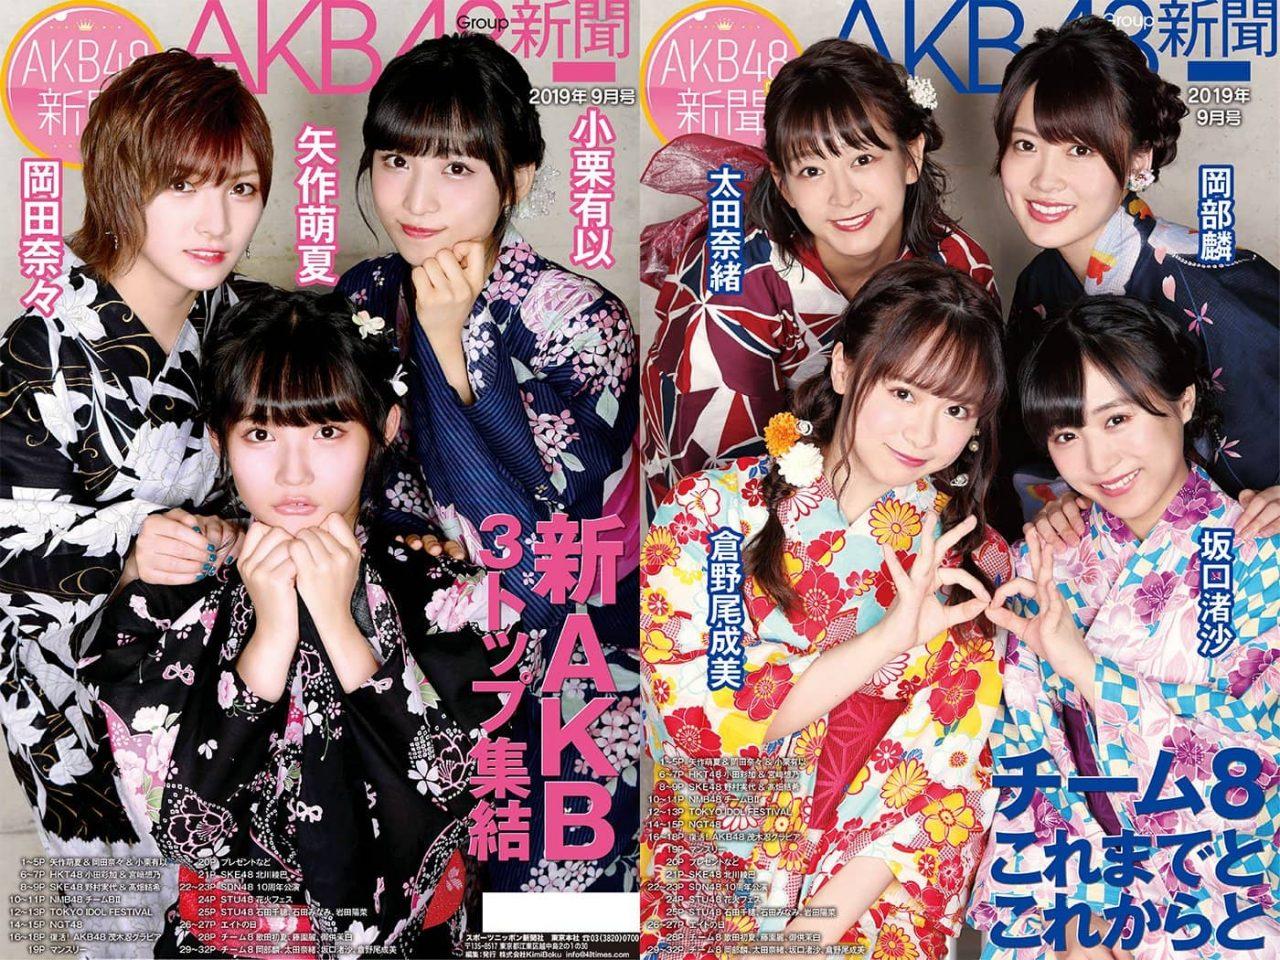 AKB48Group新聞 2019年9月号